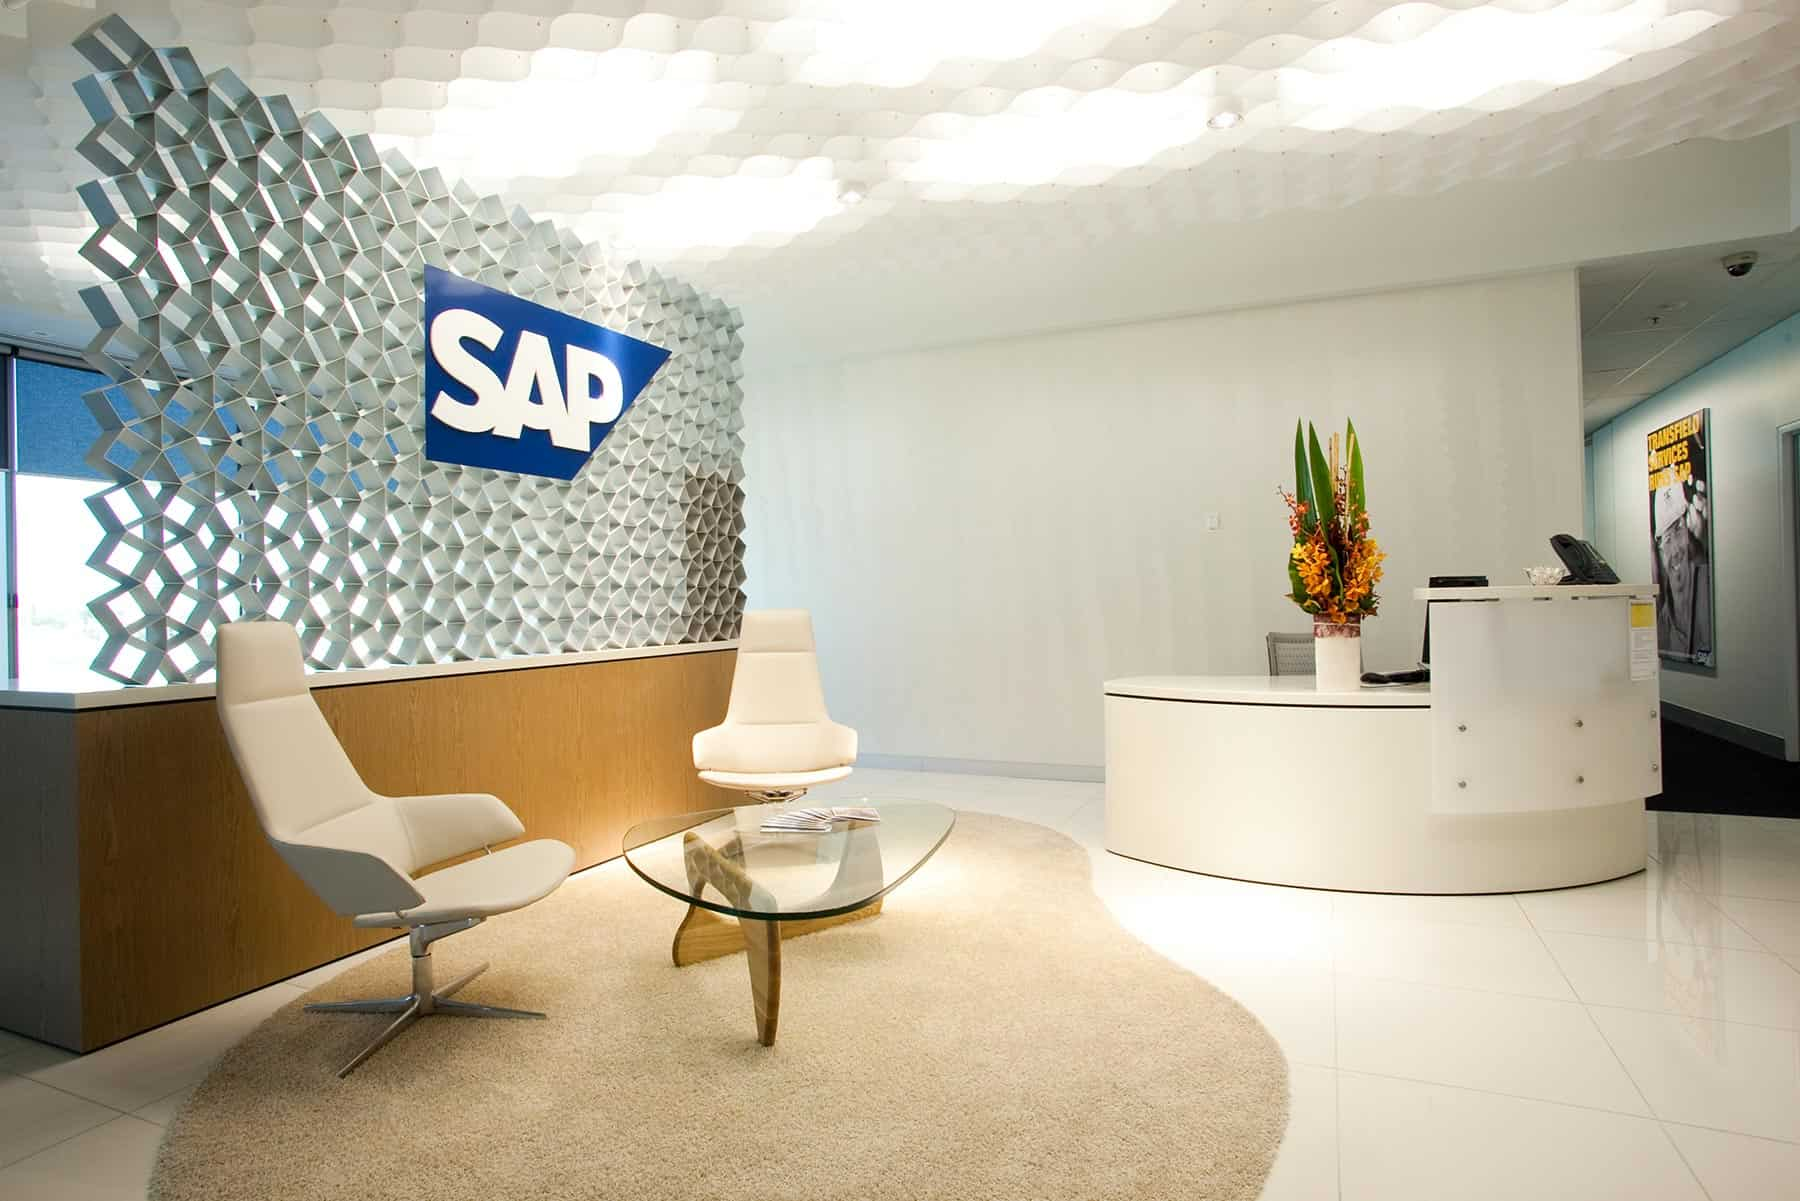 Melissa Marsden | SAP Australia